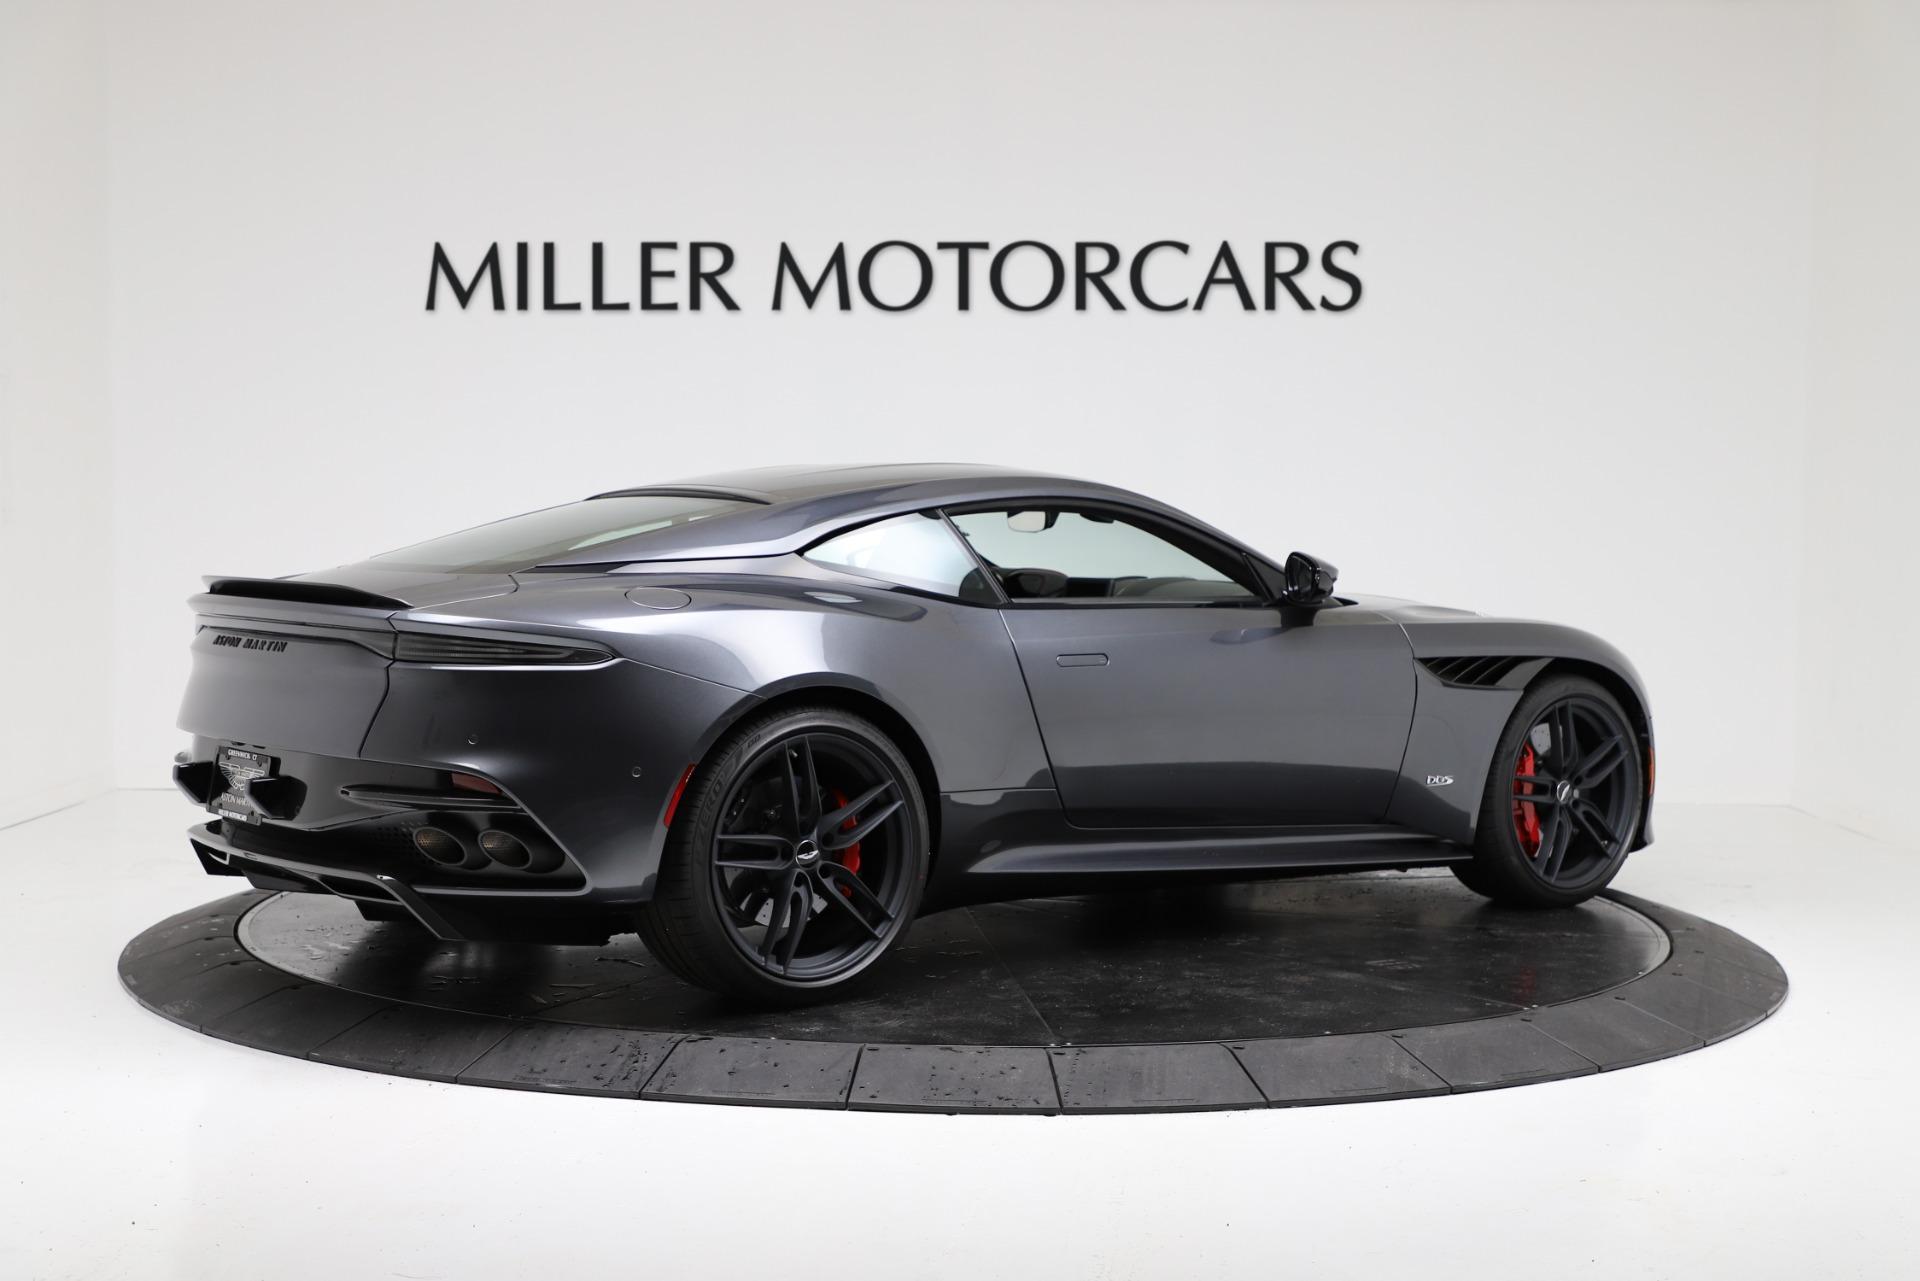 New 2019 Aston Martin DBS Superleggera Coupe For Sale In Greenwich, CT 3318_p7